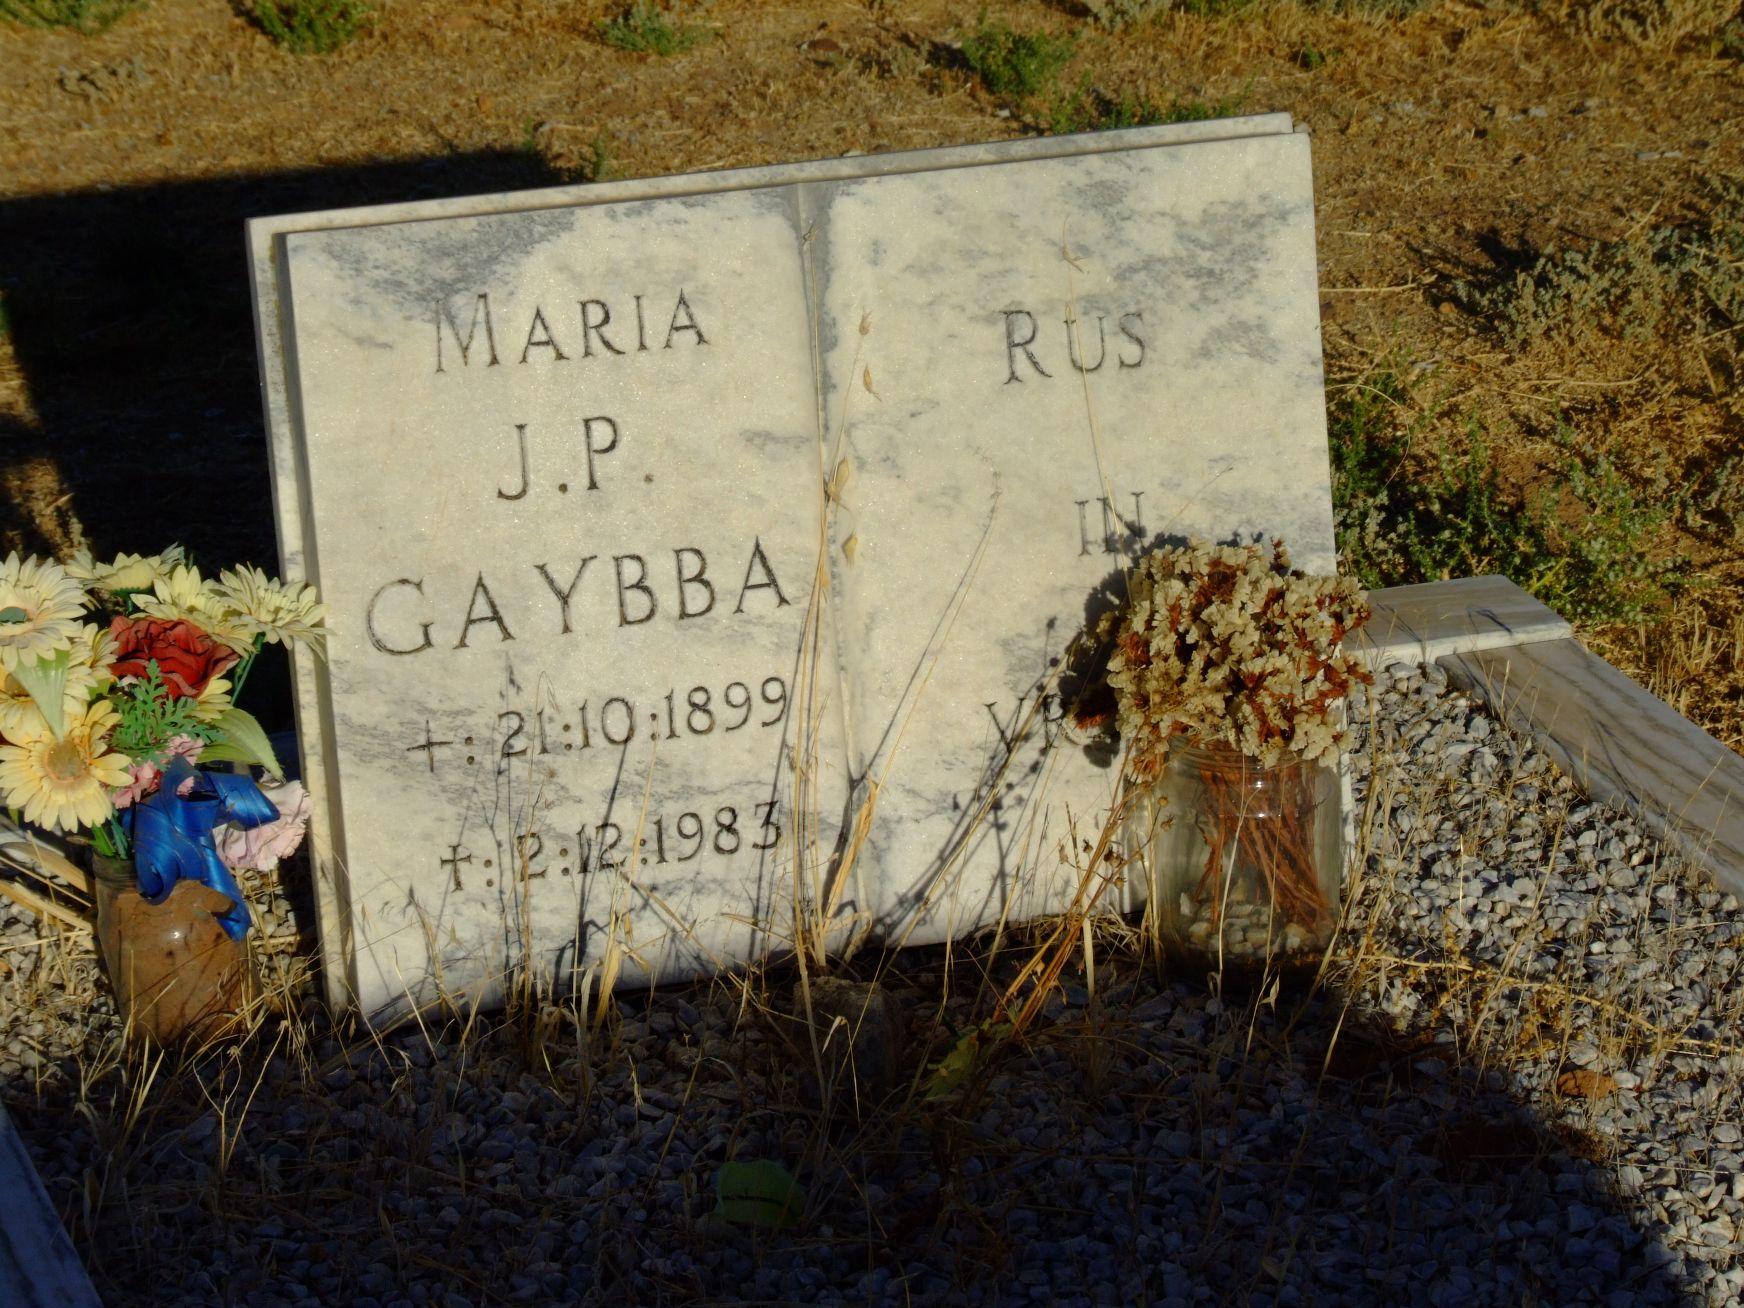 Gaybba, Maria J. P.